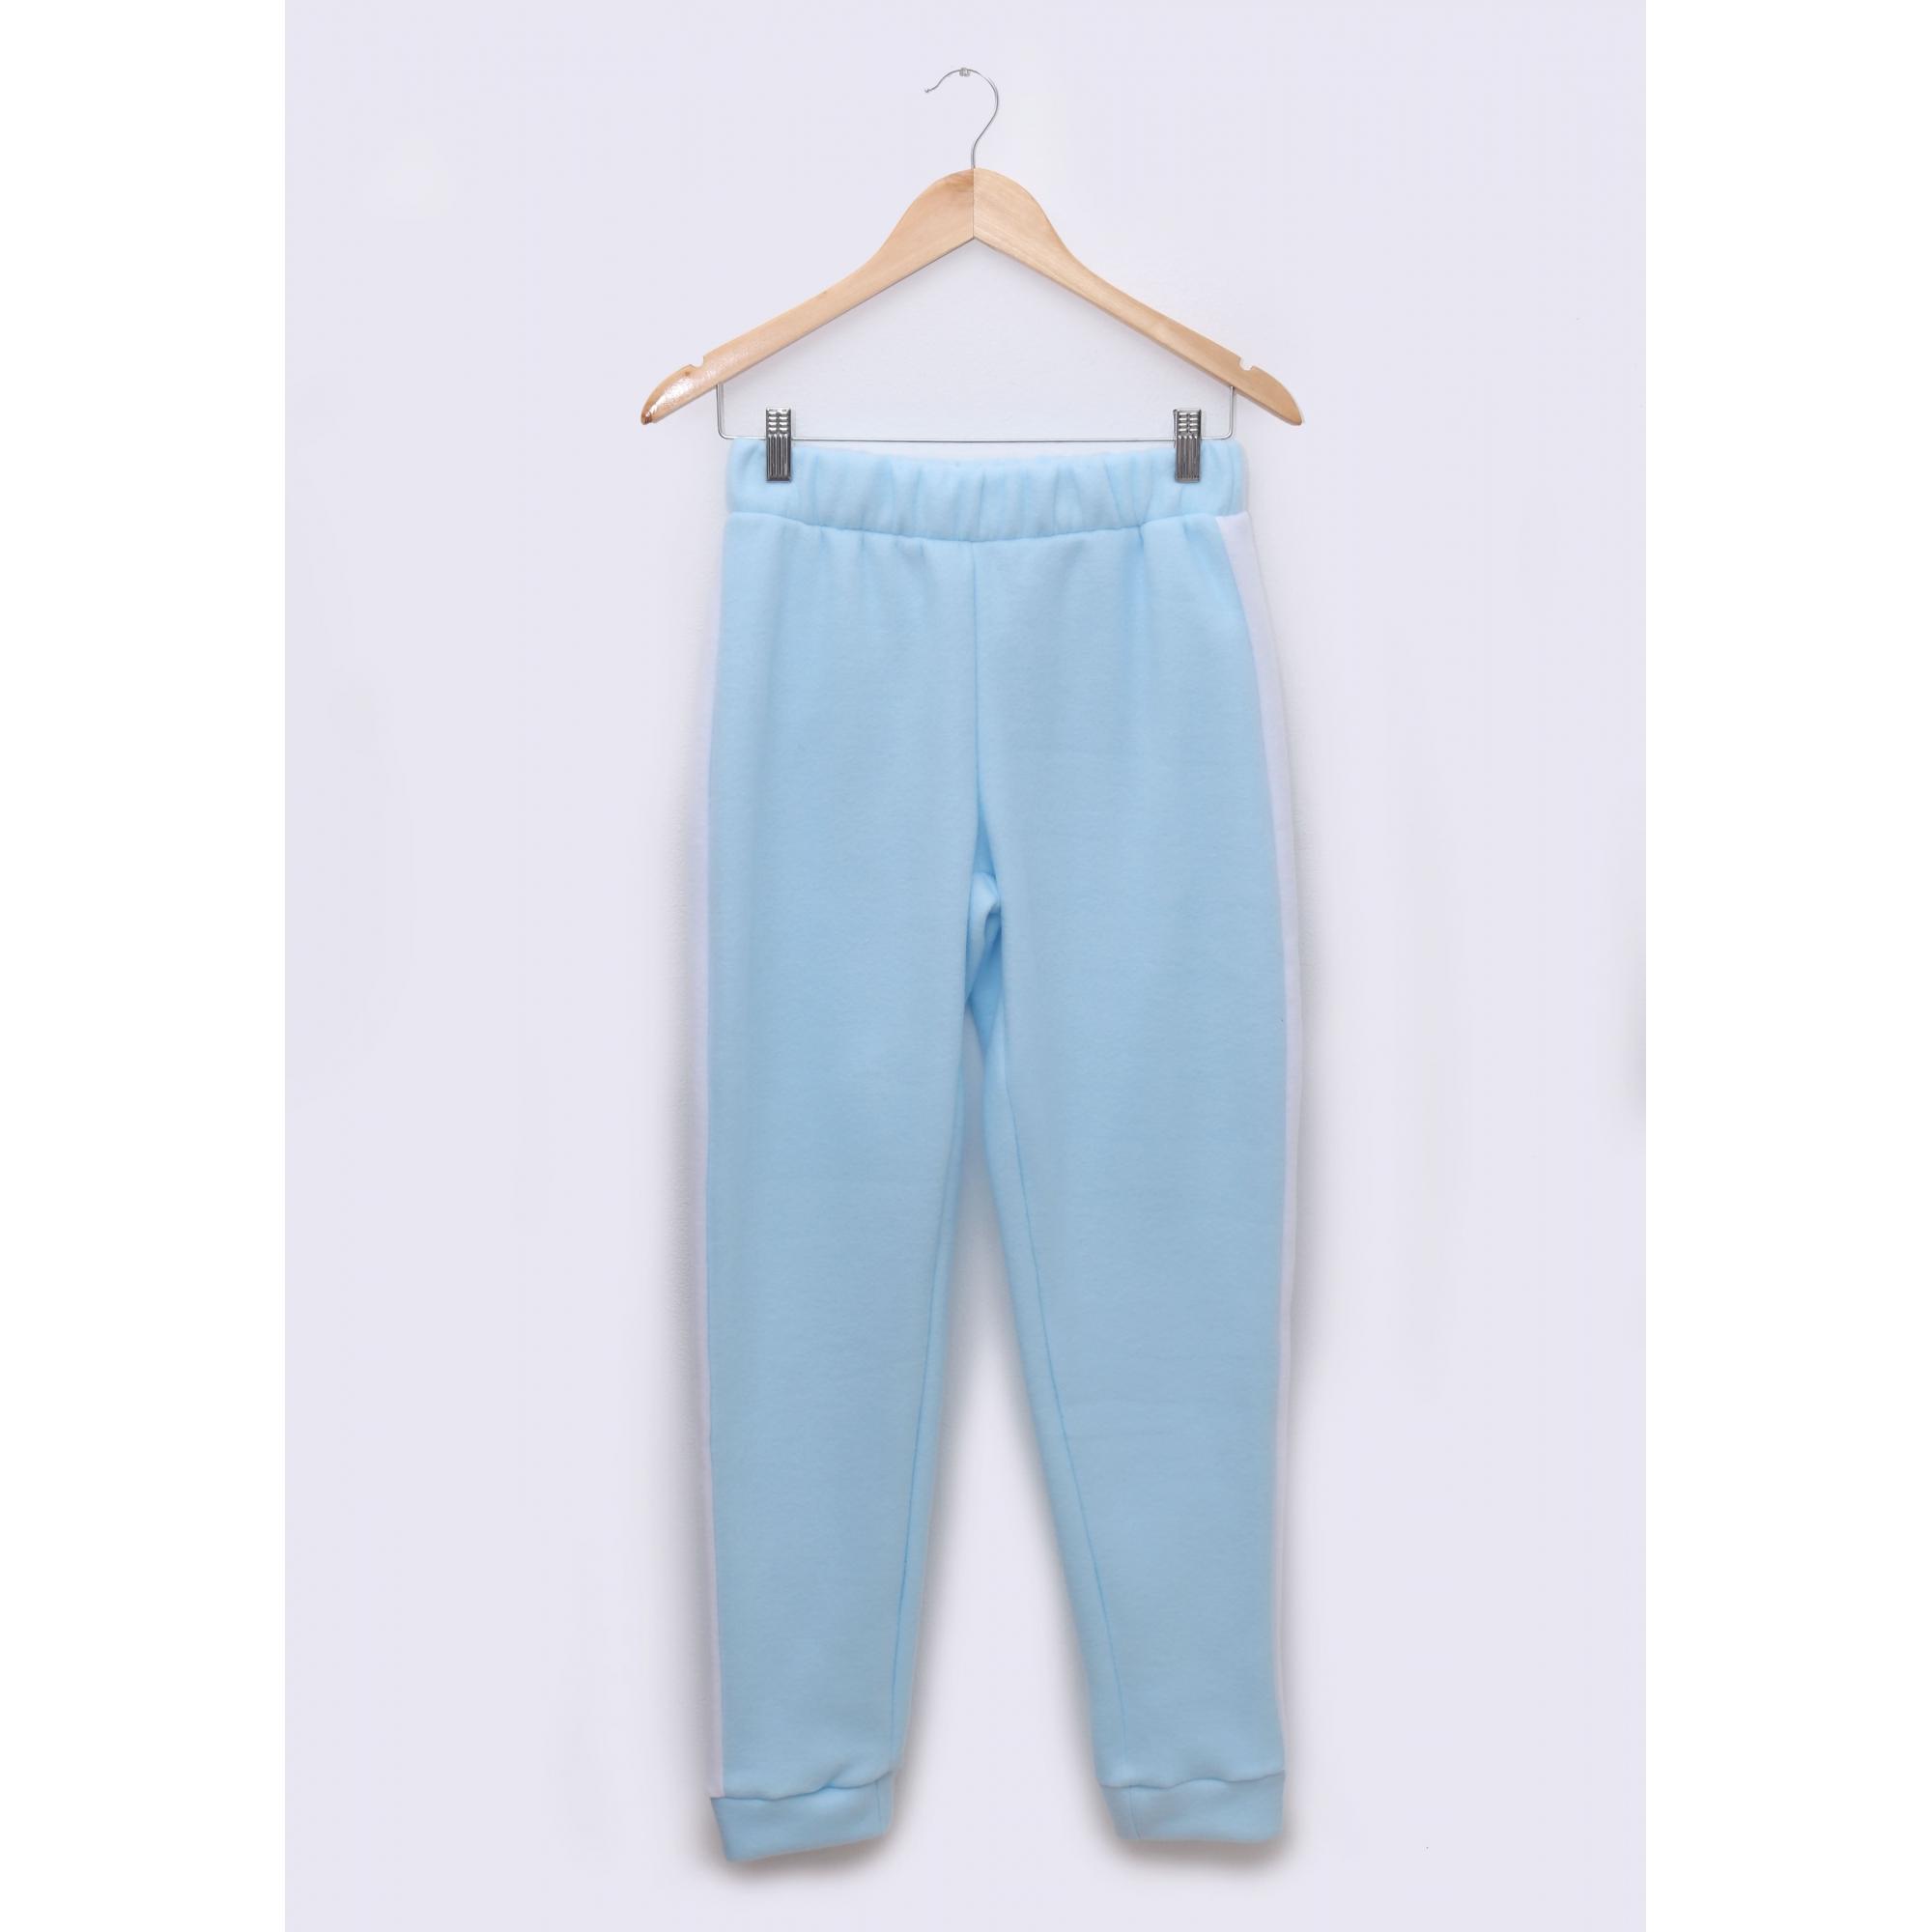 Pijama Adulto em Soft Fleece Azul